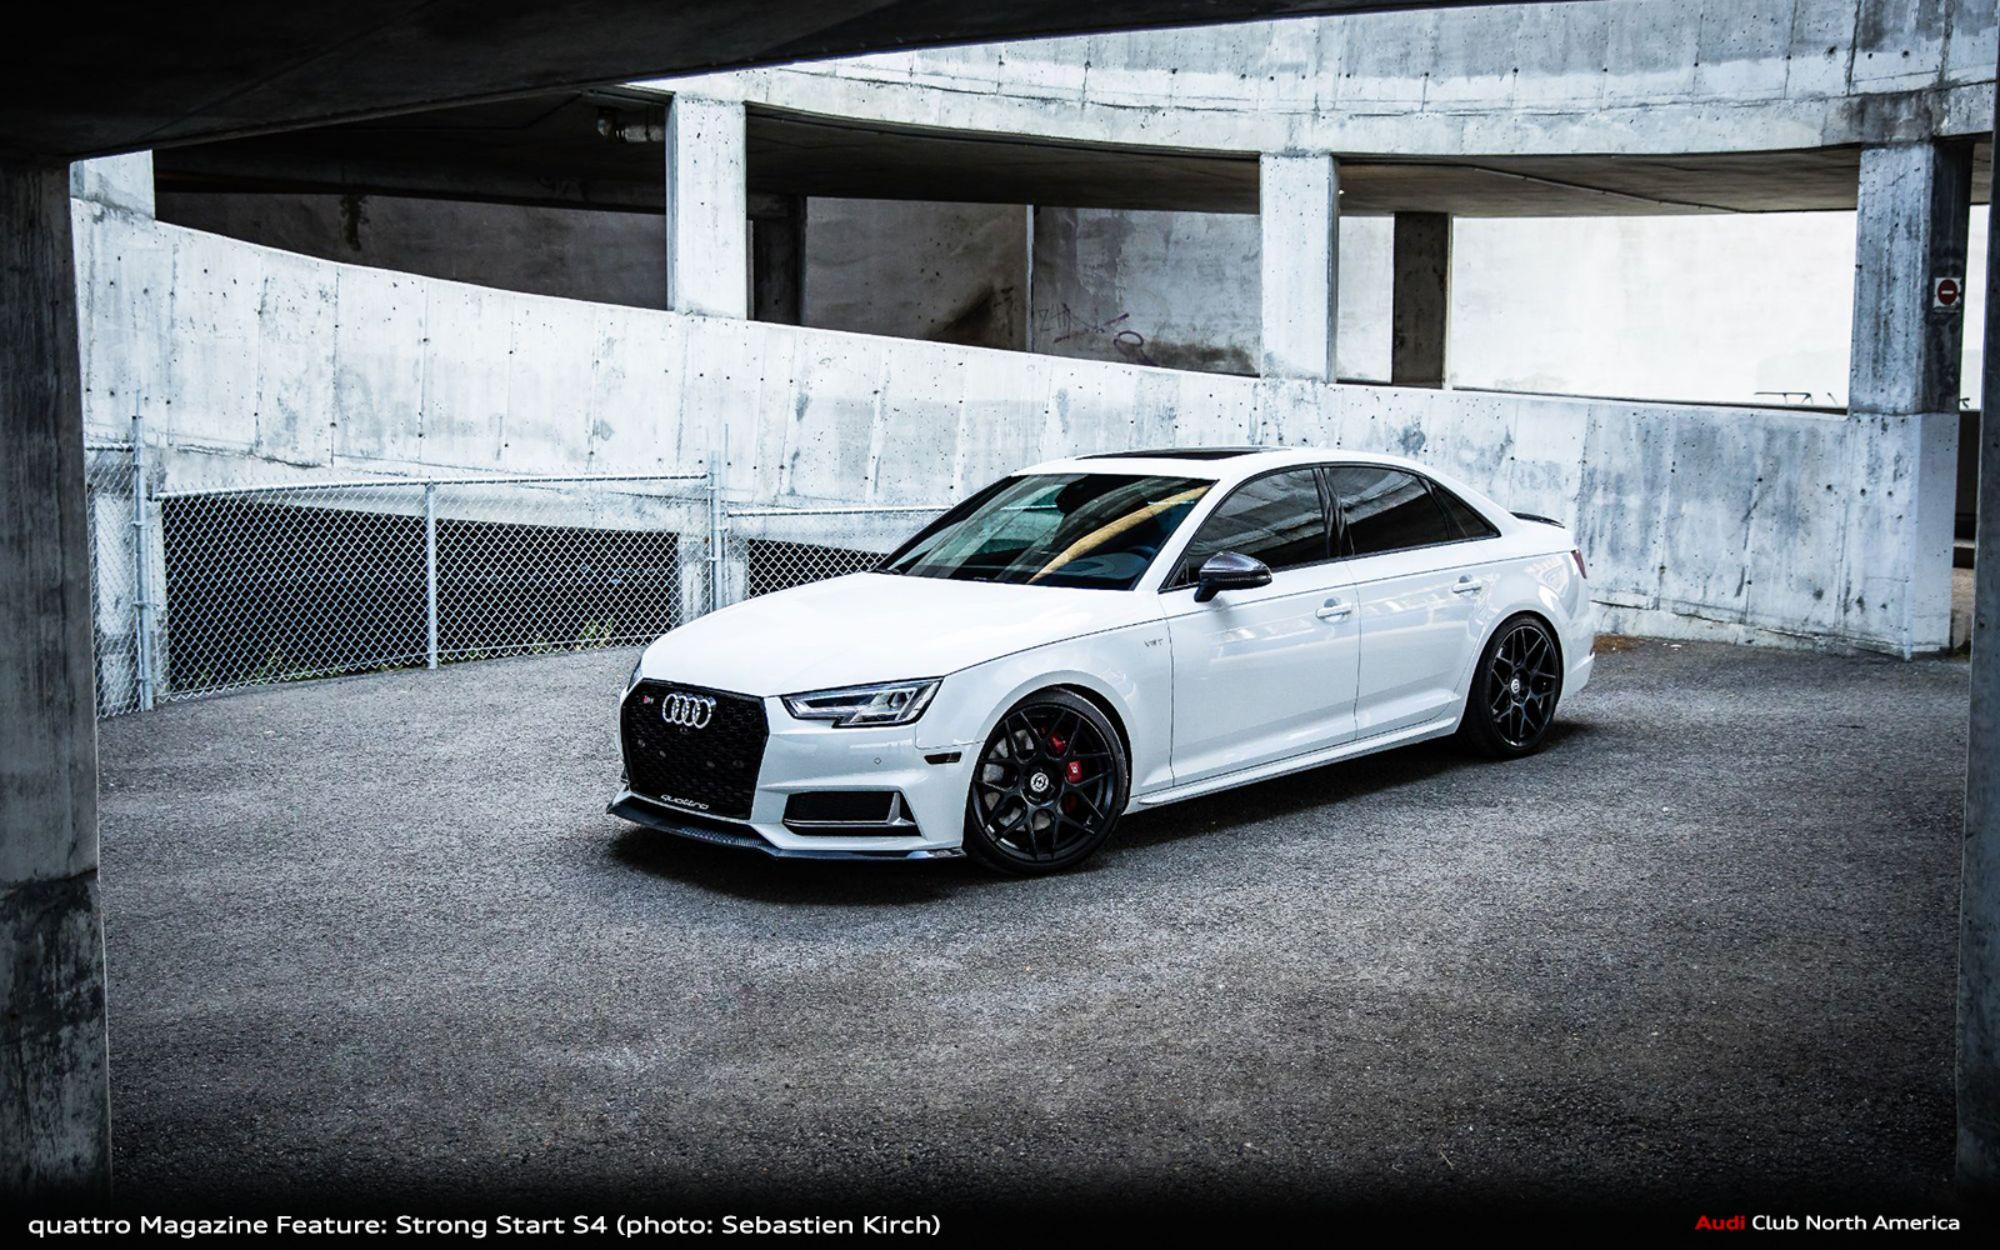 quattro Magazine Feature Car: Sebastien Kirch's Strong Start S4